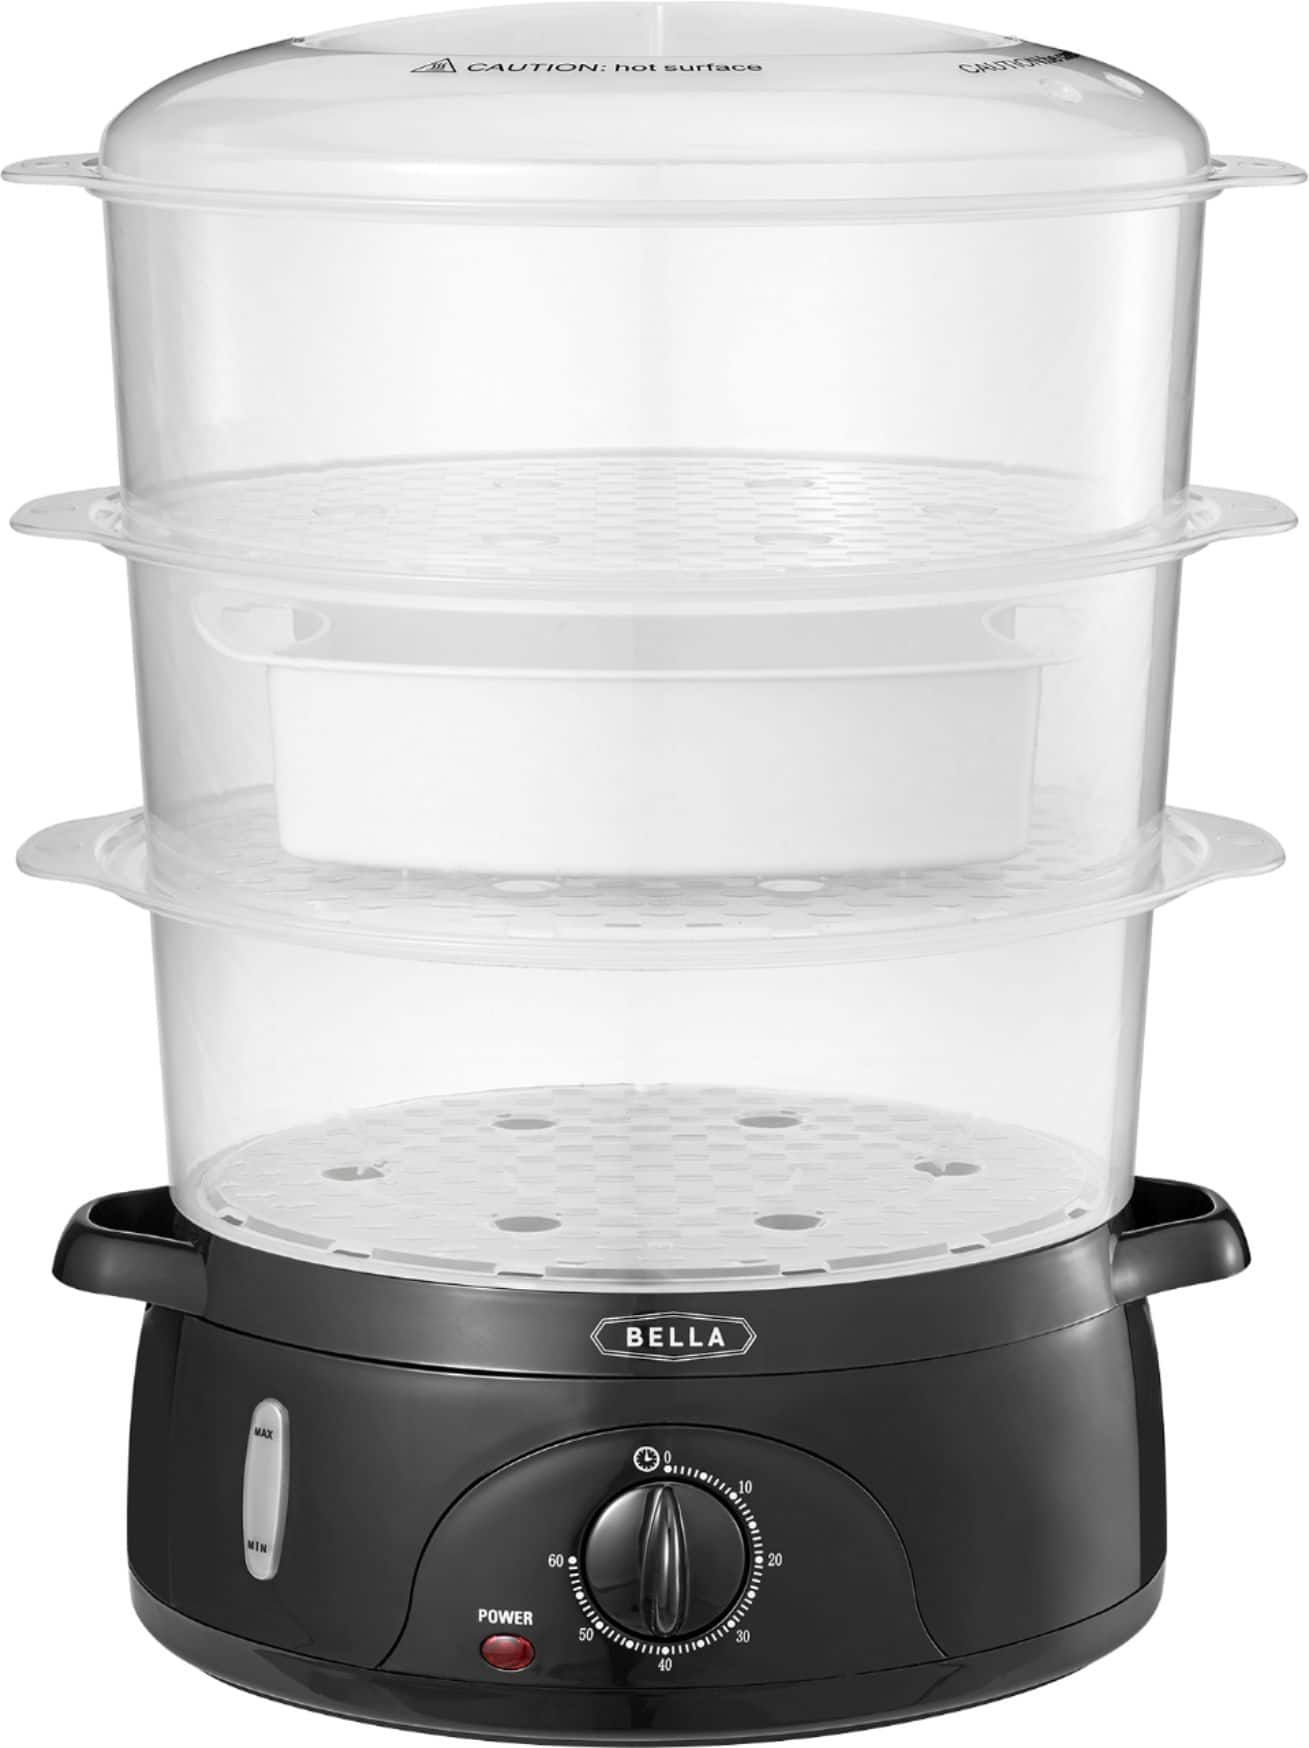 Bella - 9.5-Qt. 3-Tier Food Steamer - Black/Clear, $14.99, Best Buy